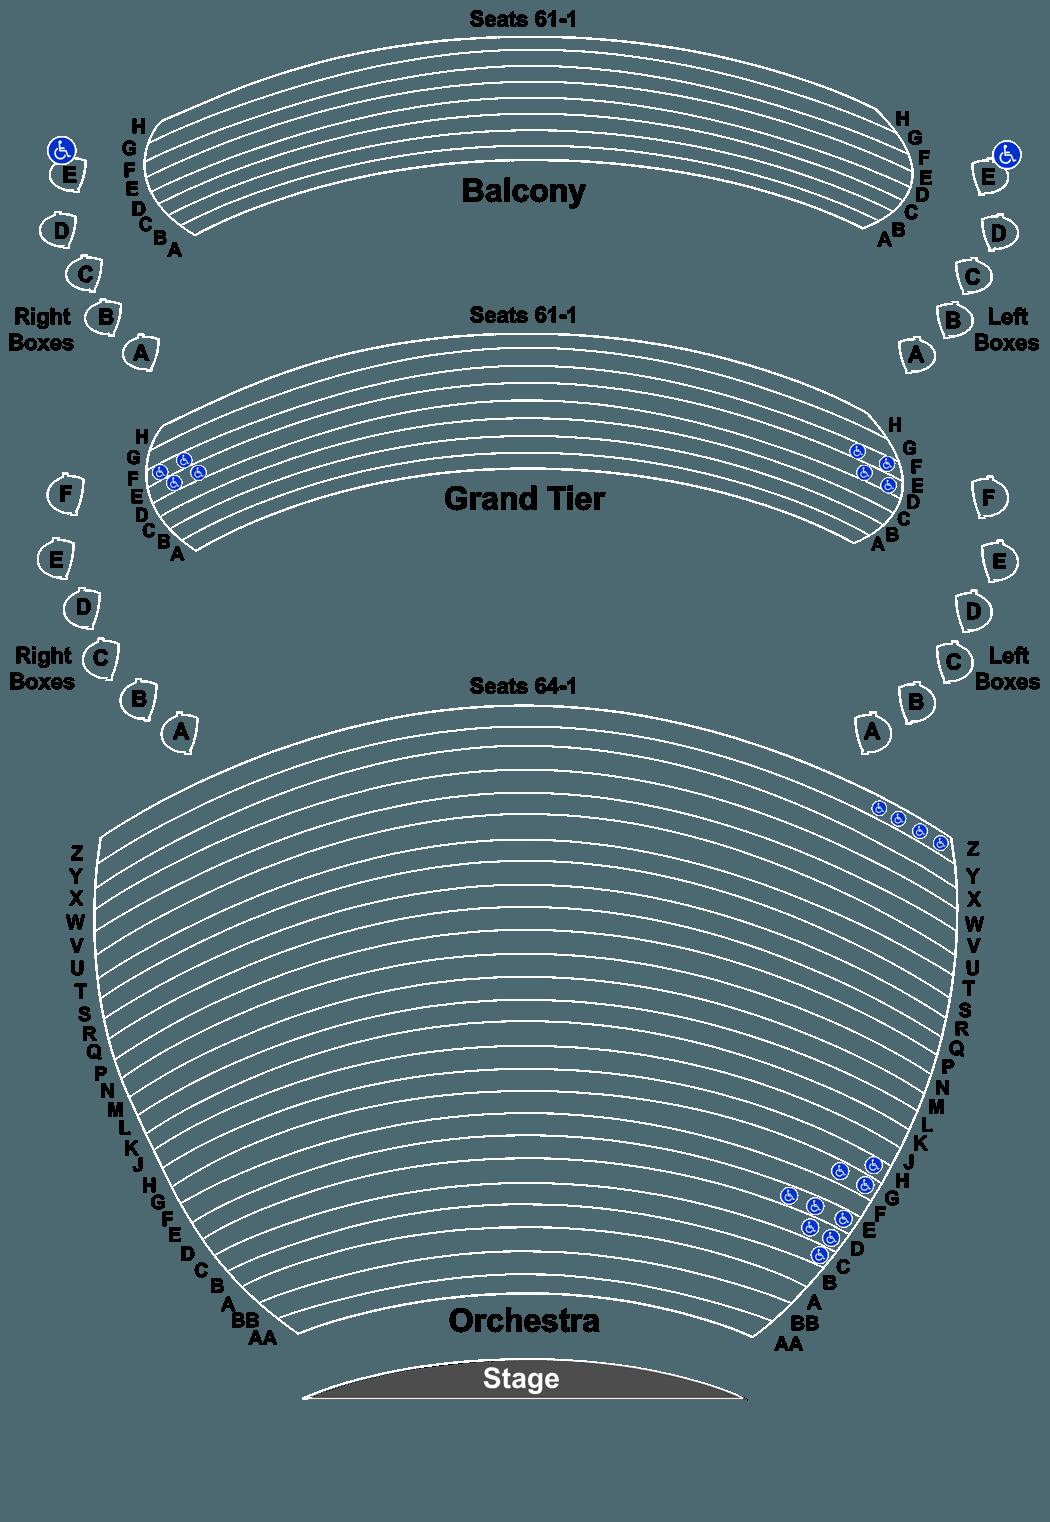 Hamilton Tickets At Whitney Hall At The Kentucky Center On 0620